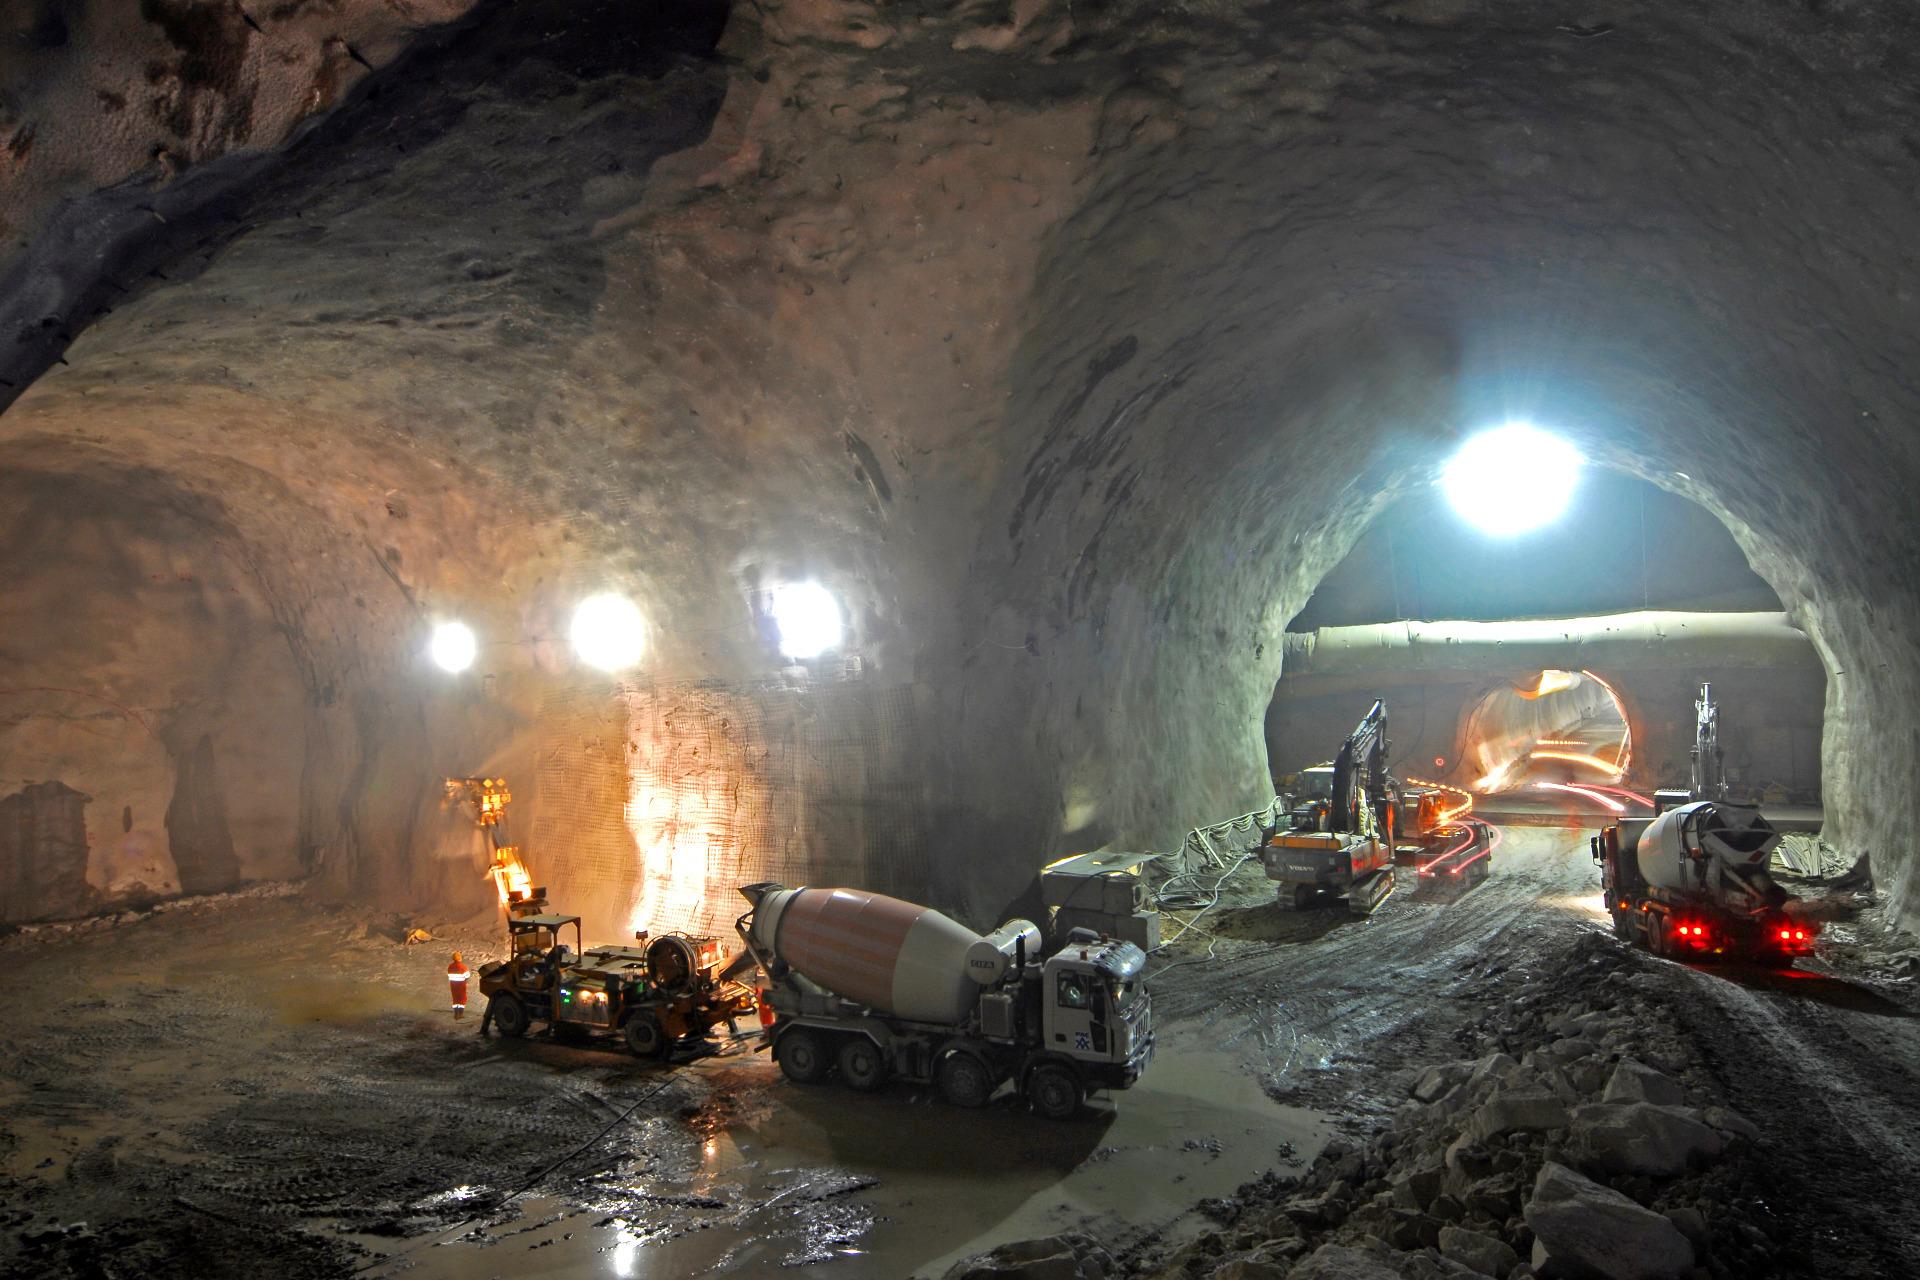 Cast Concrete Spacers : Brenner basistunnel max frank